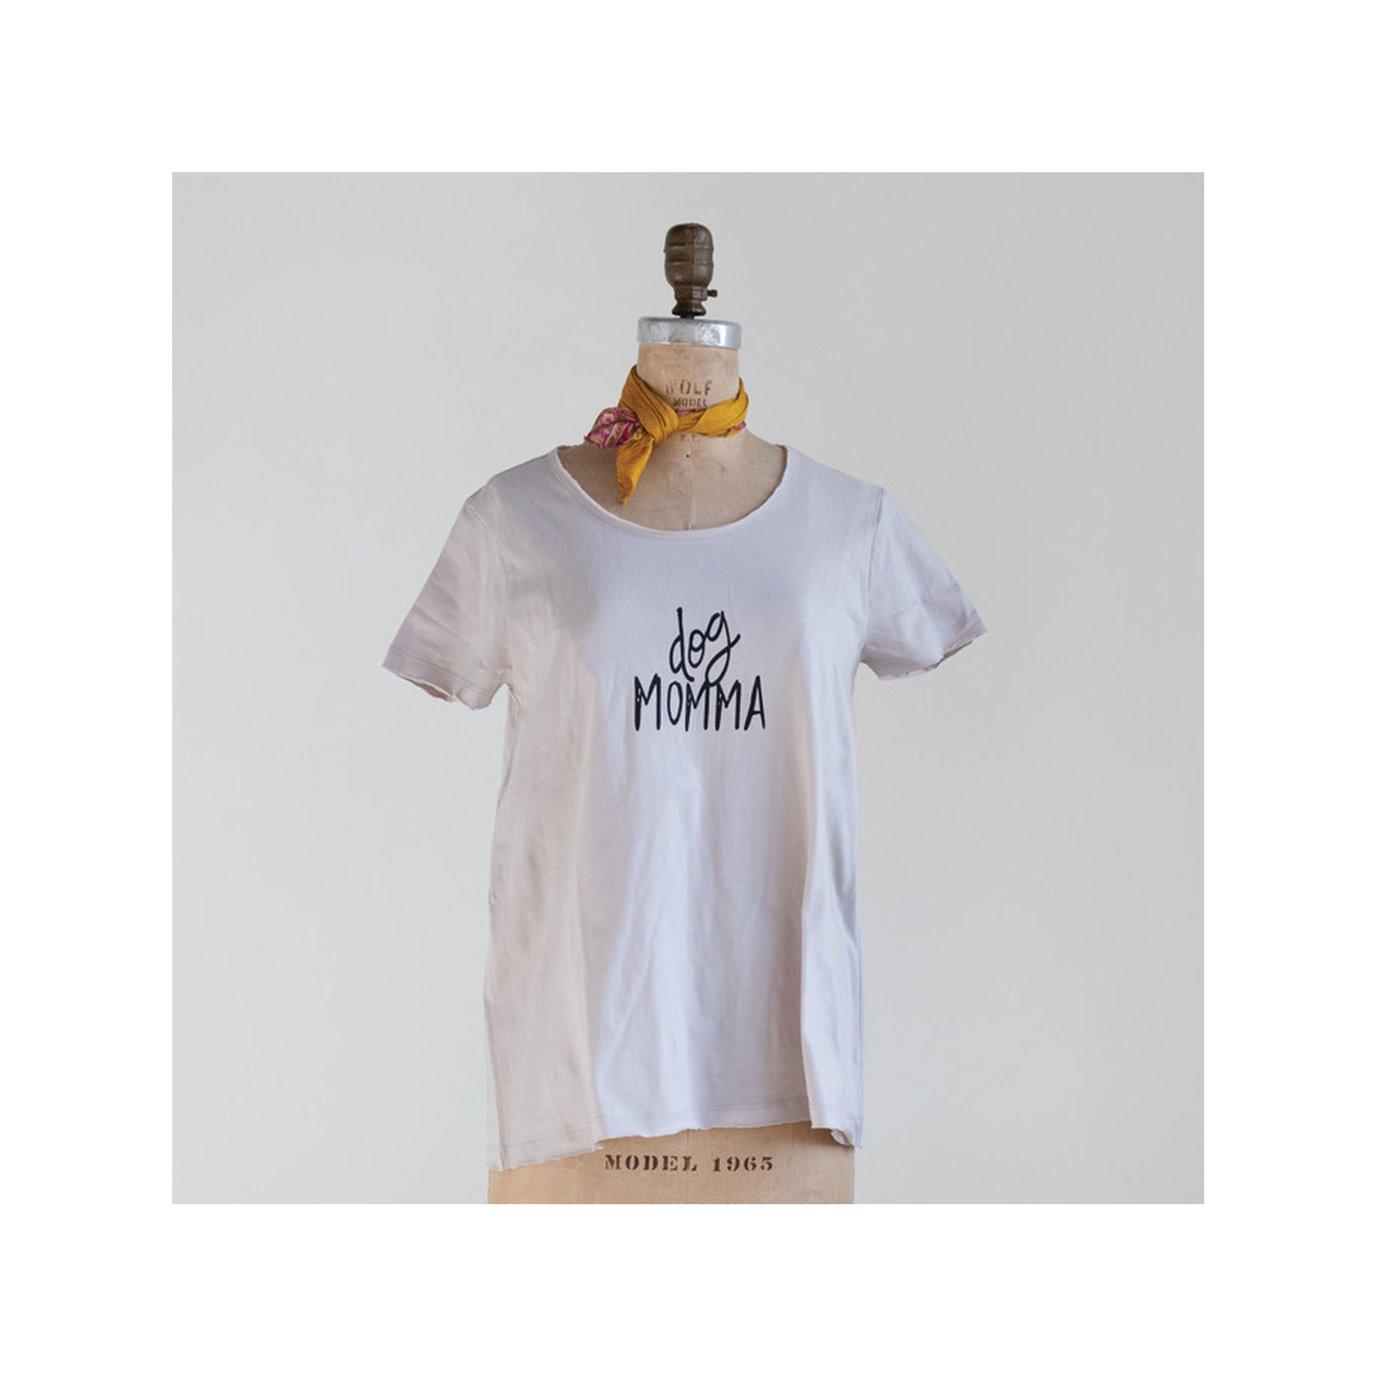 "Cotton Screen Printed T-Shirt ""Dog Momma"", Grey & Black, Large"